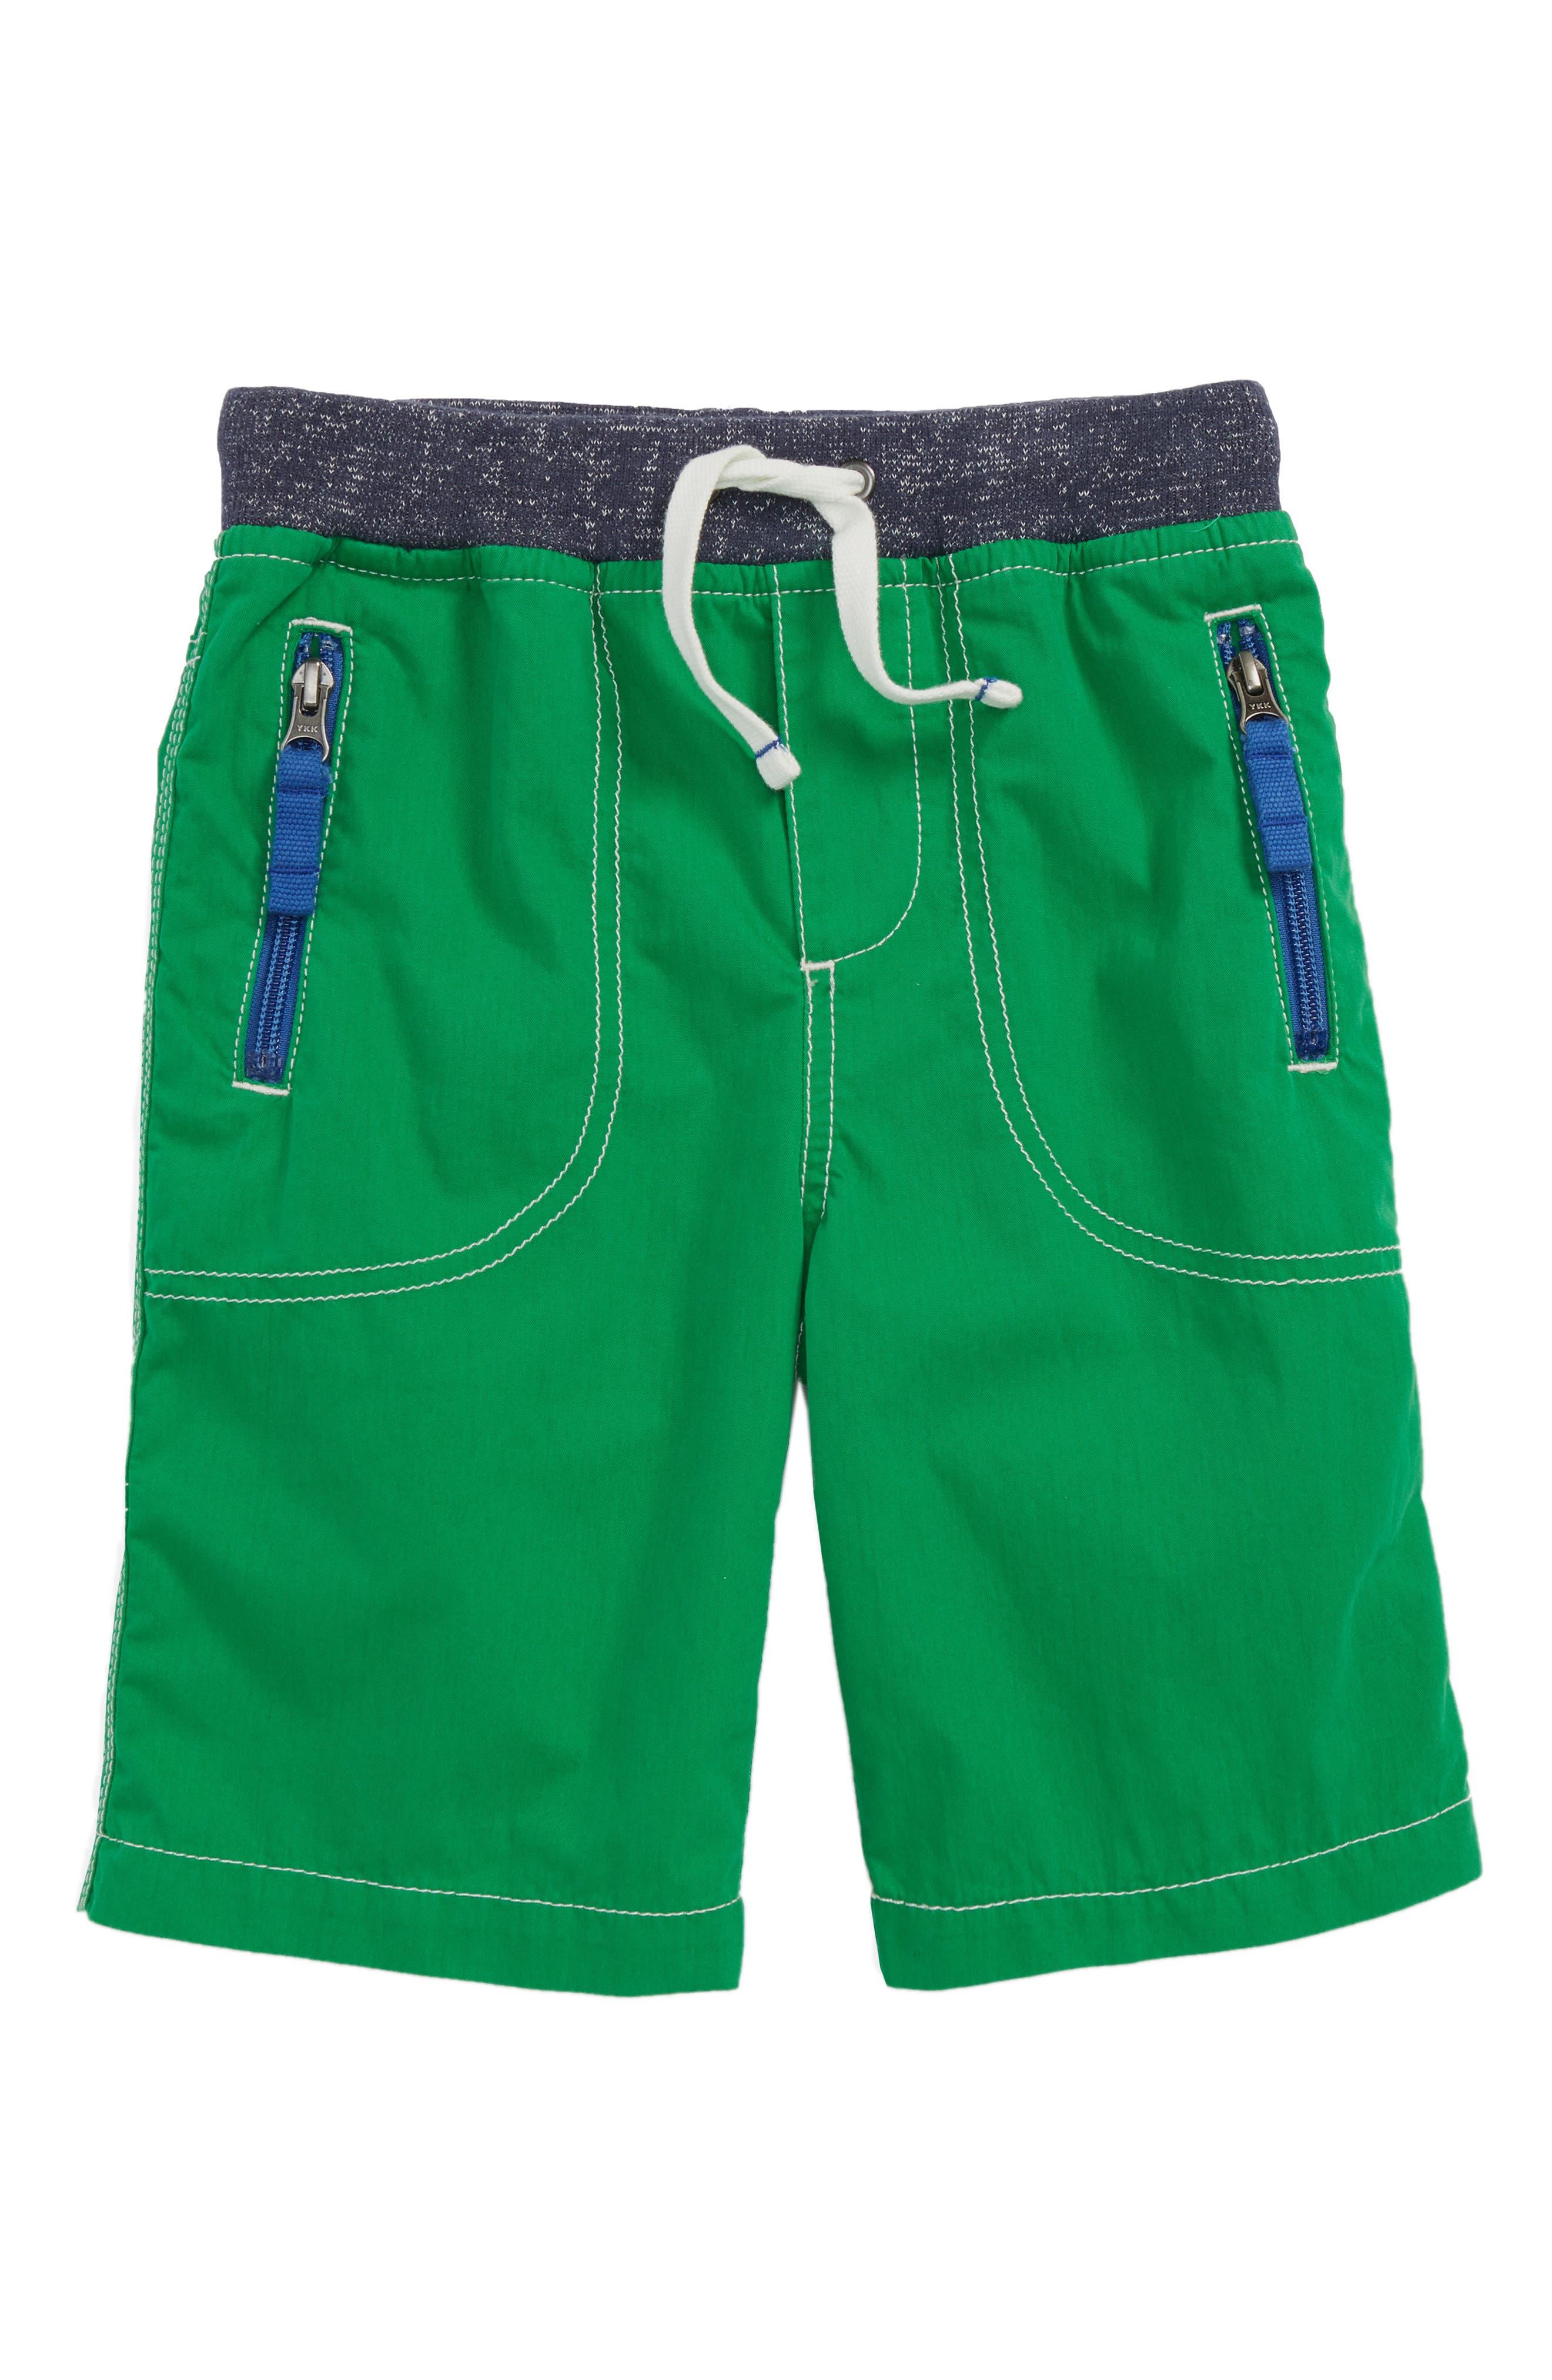 Adventure Shorts,                         Main,                         color, Runner Bean Green